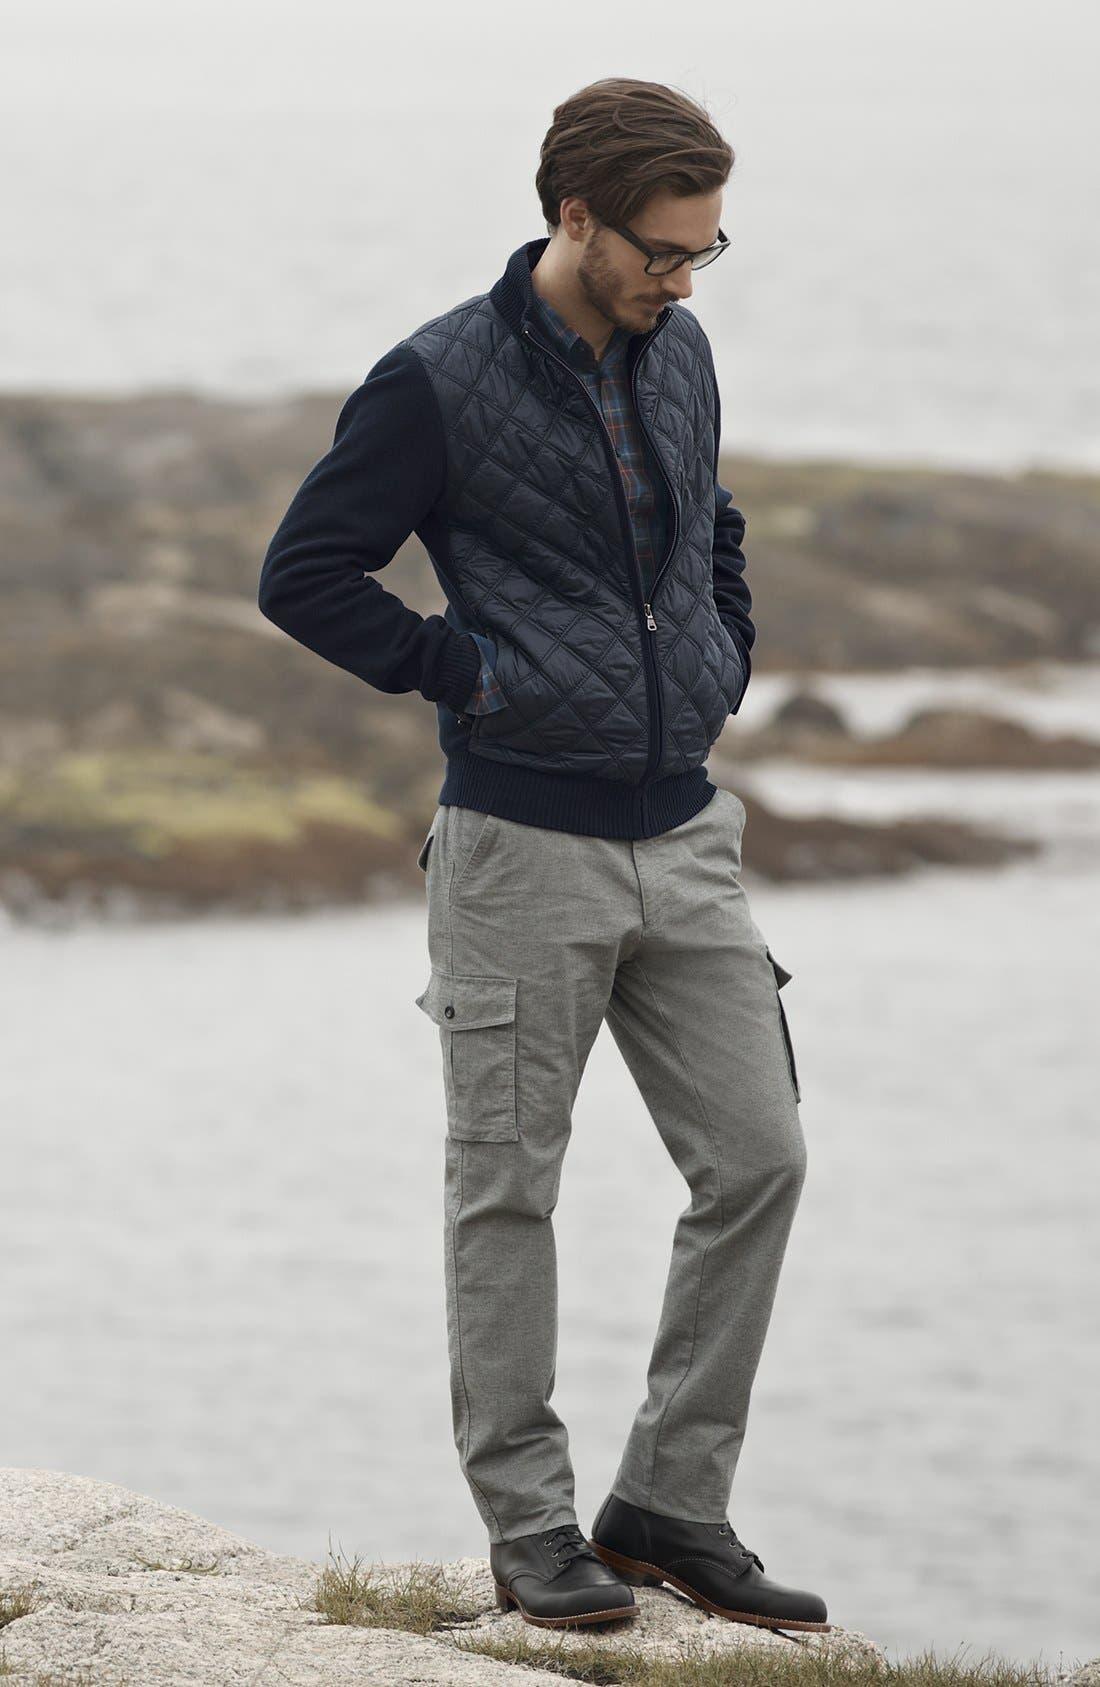 Alternate Image 1 Selected - BOSS HUGO BOSS Sweater, Sport Shirt & Pants